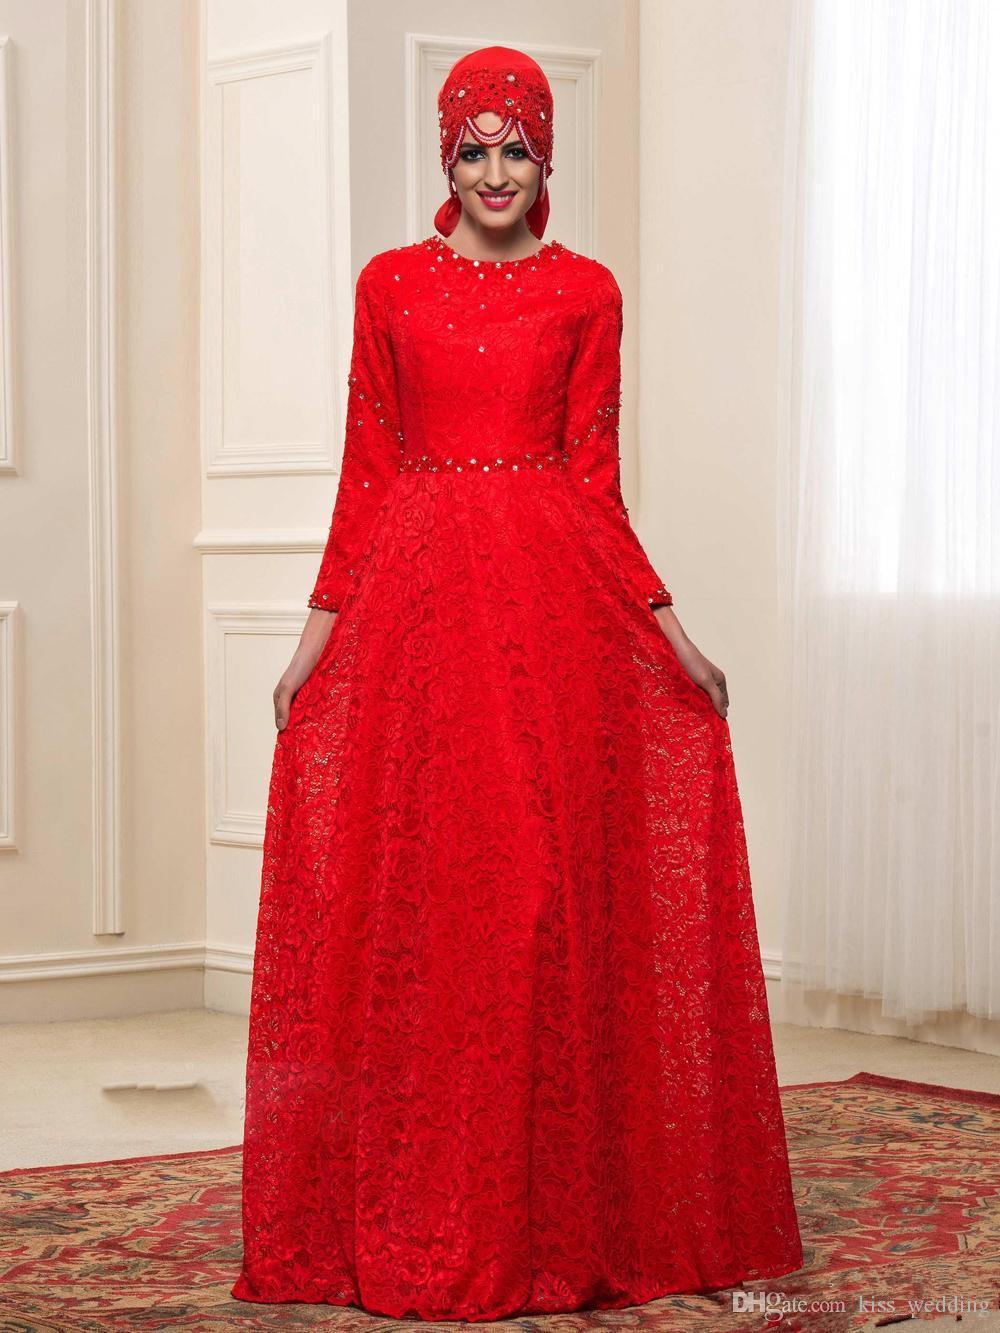 Traditional Lace Muslim Arabic Wedding Dresses Long Sleeves Hijab Islamic Weddings Gown Bridal Formal Wear With